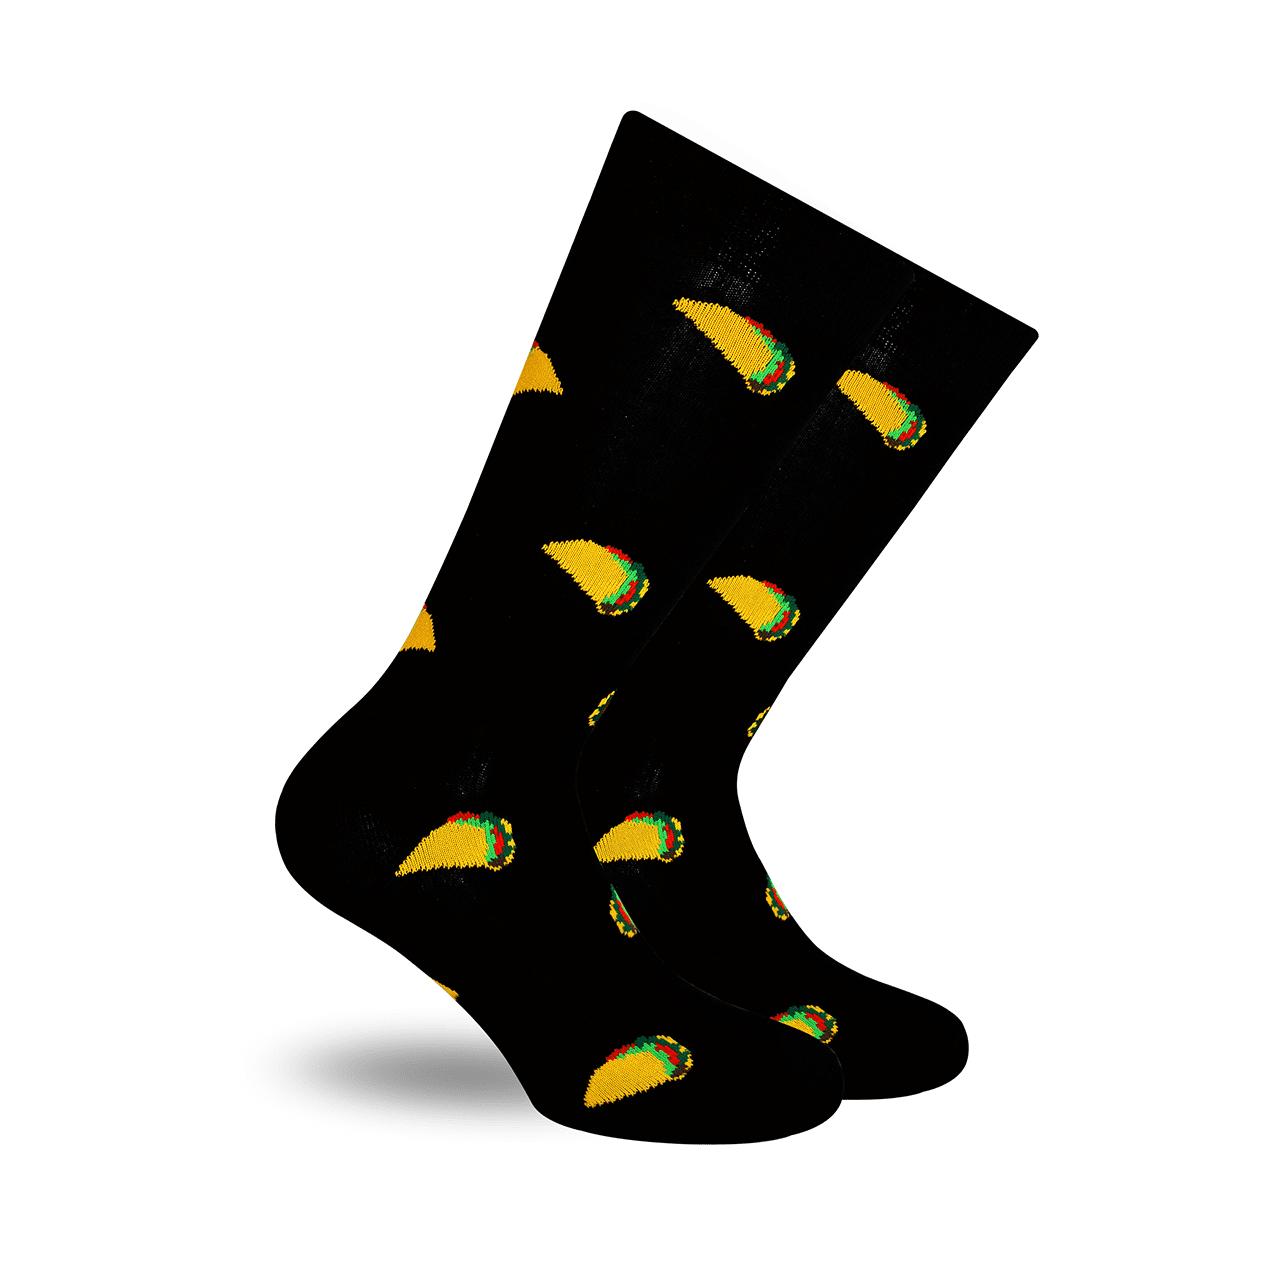 Tacos Negro Calcetín con Diseño Mexicano